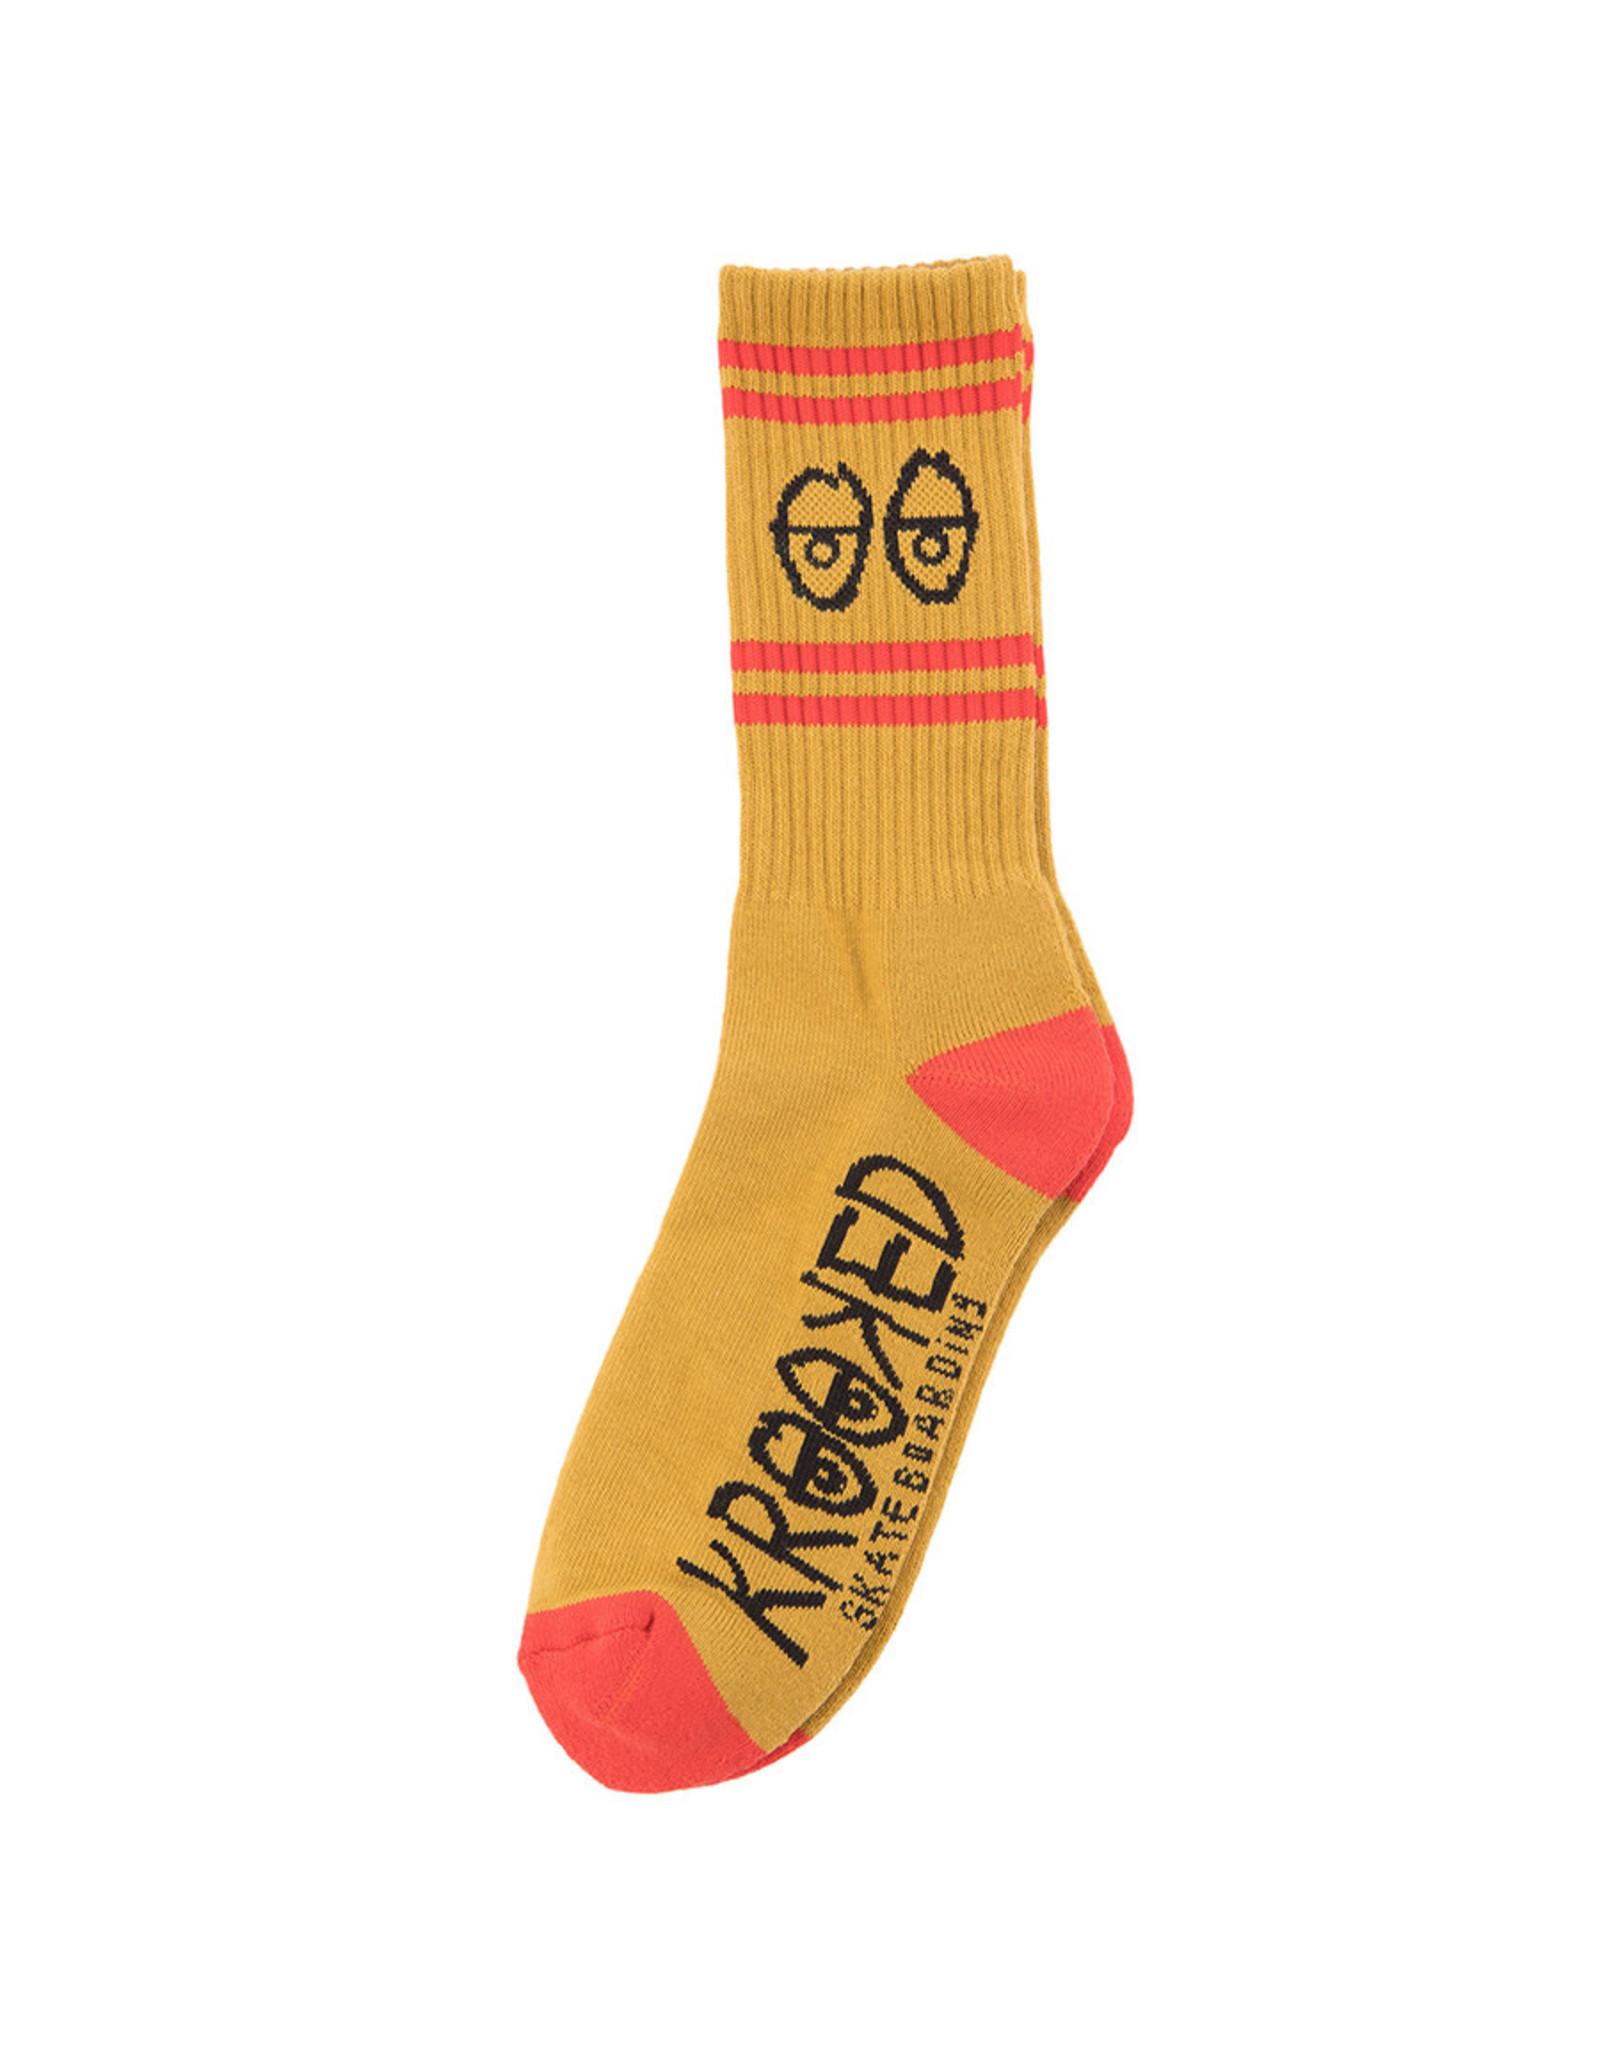 Krooked Krooked Socks Eyes Crew (Gold/Red/Black)